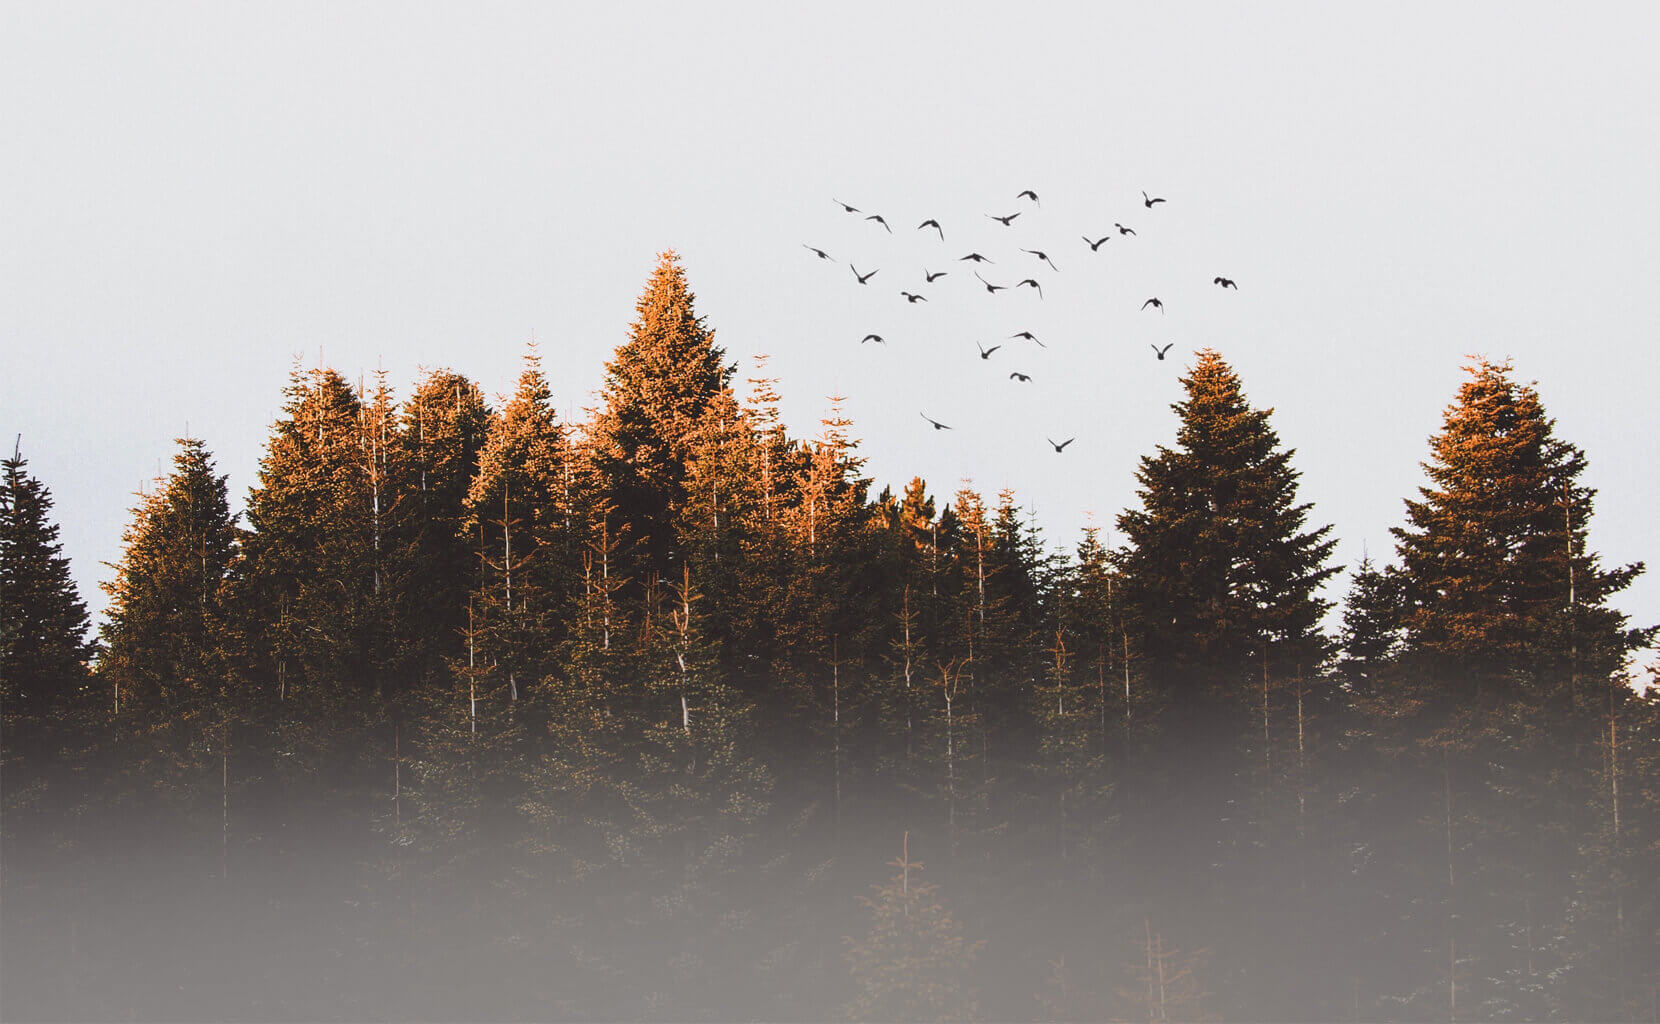 Birds above the treetops